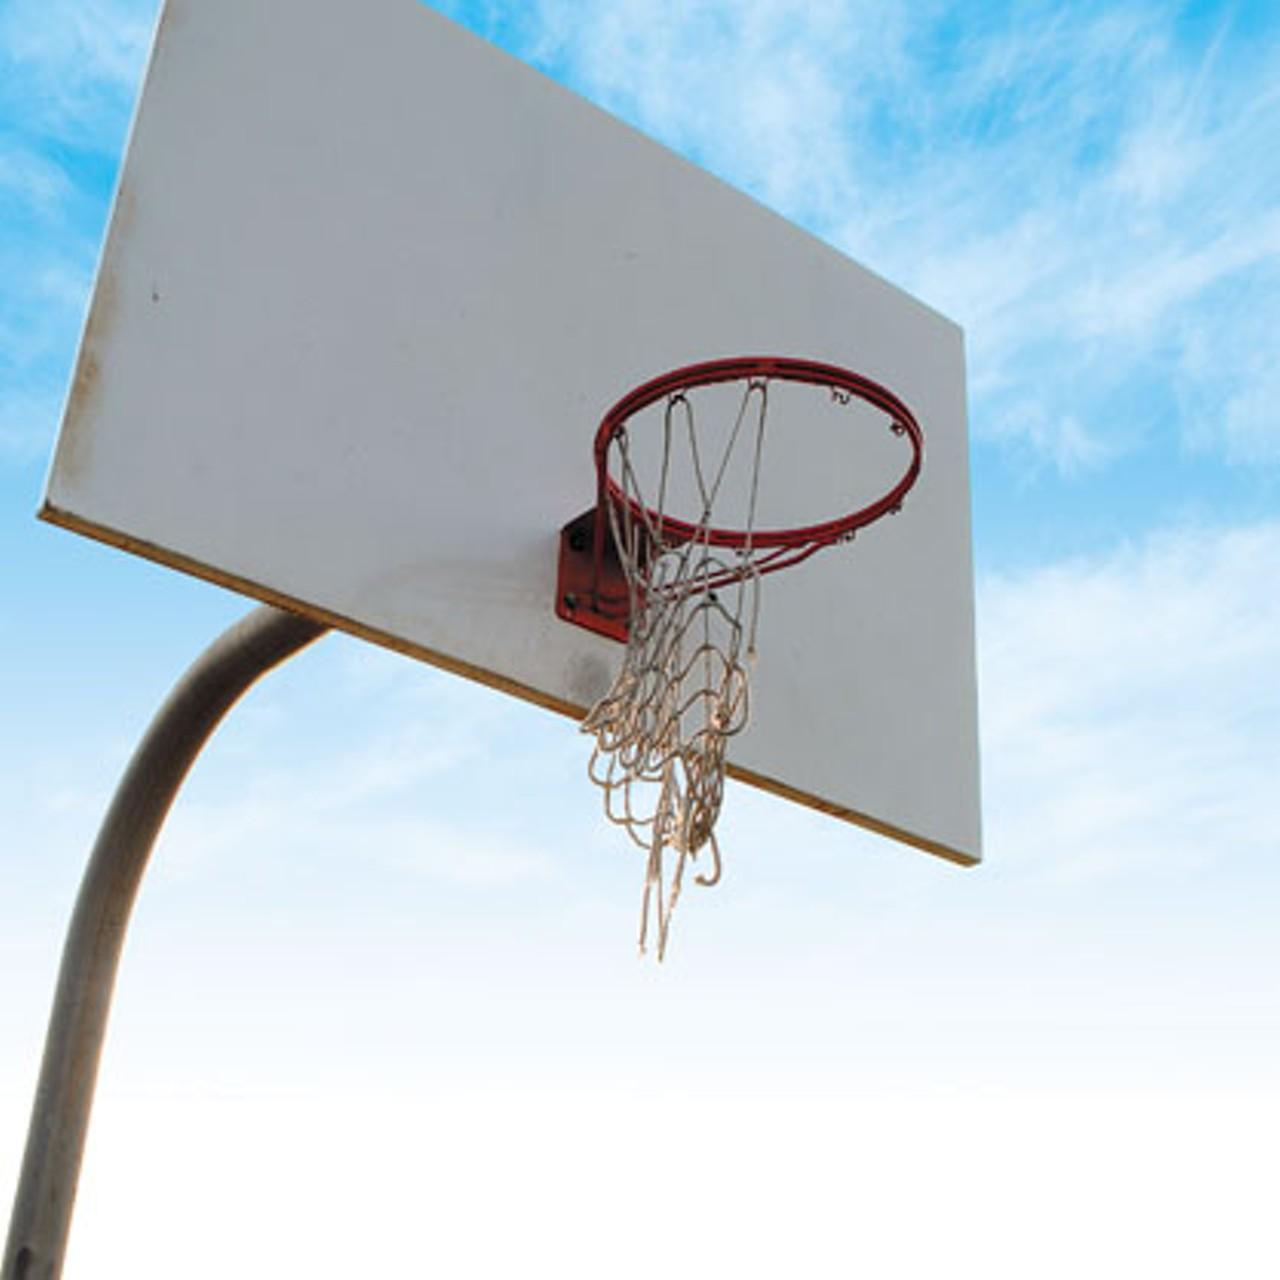 where hoop dreams die news features cleveland scene